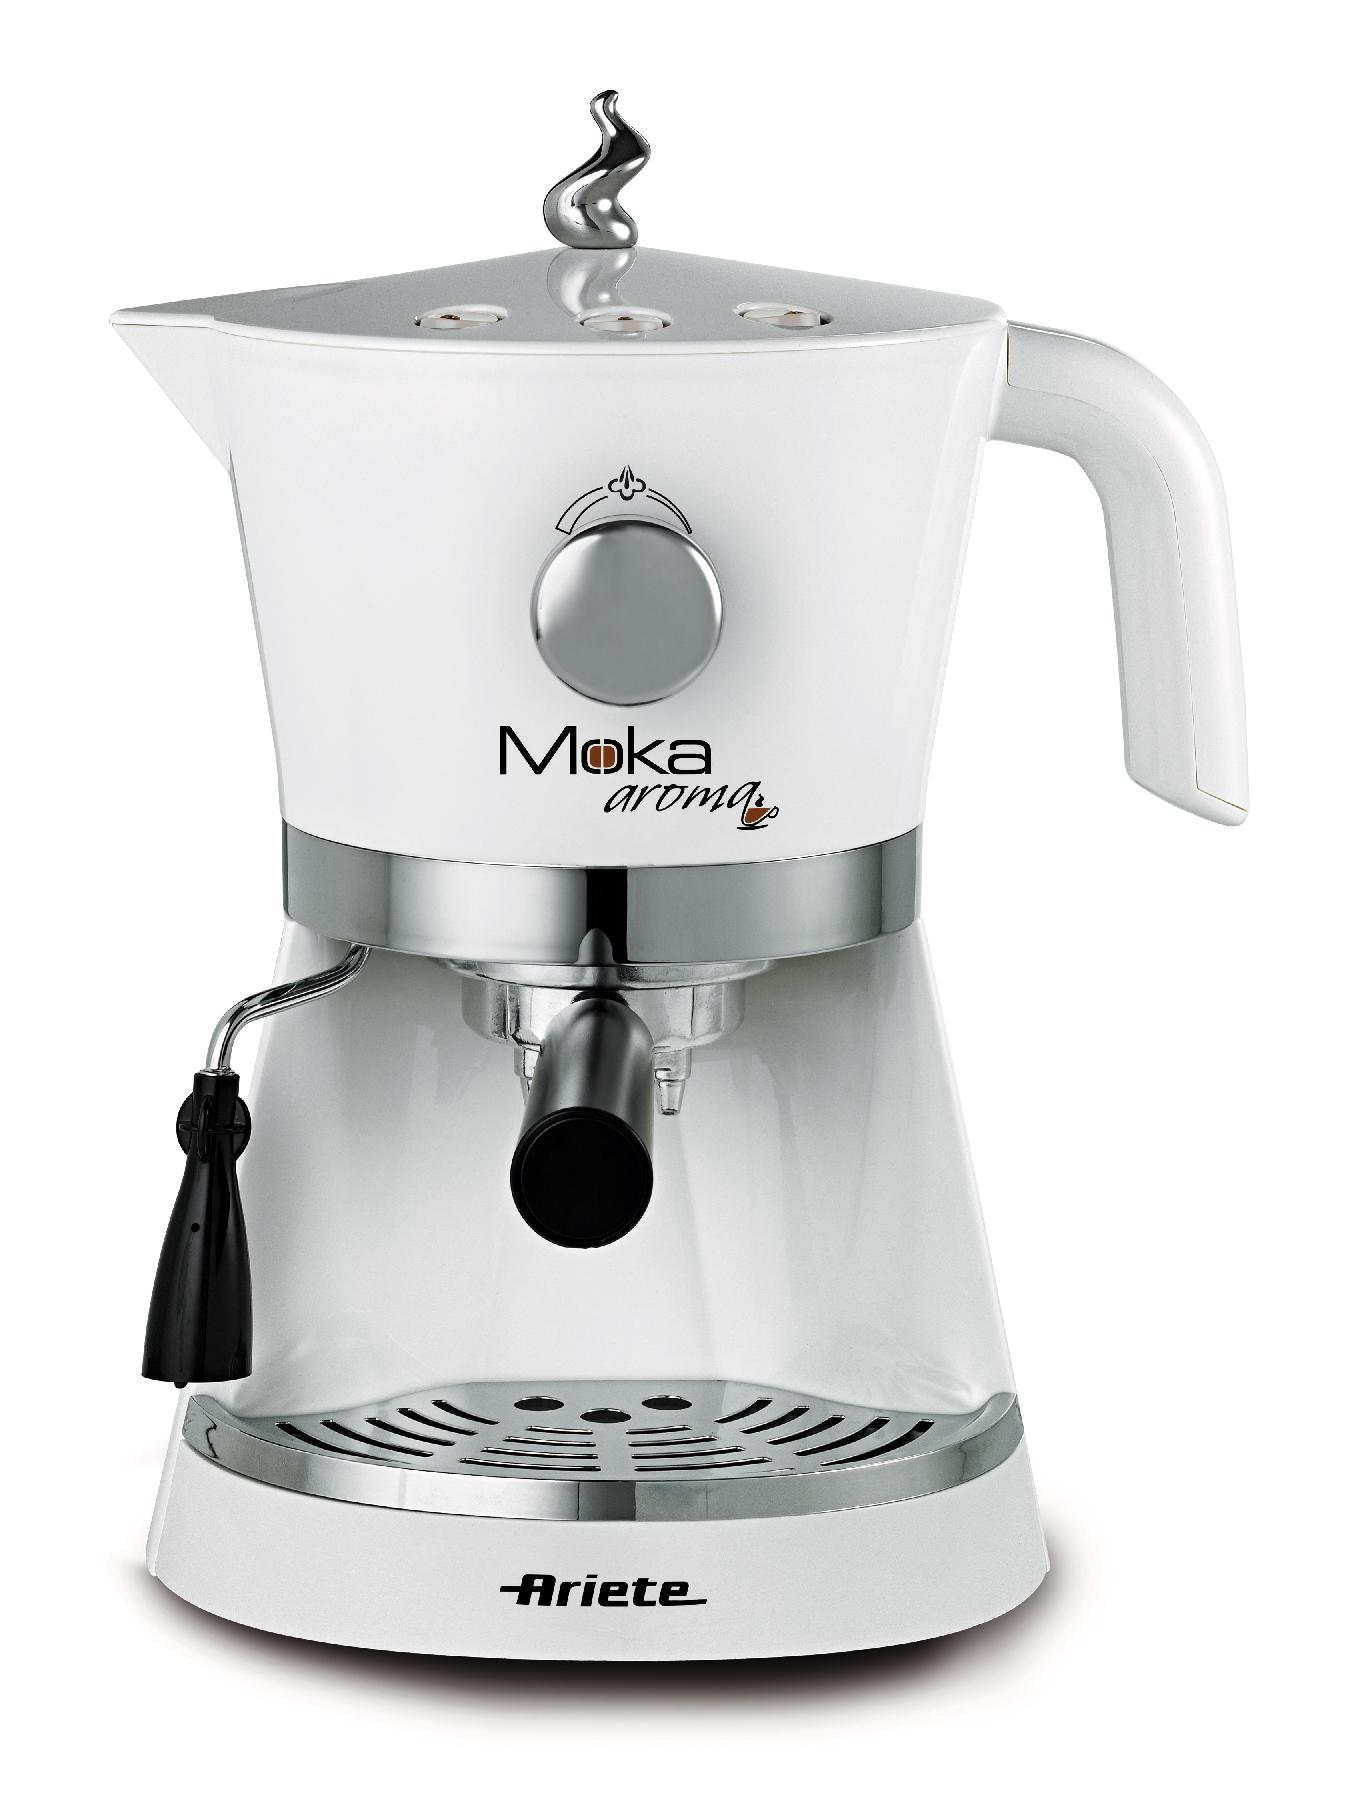 prezzo Moka Aroma Espresso bianca in offerta